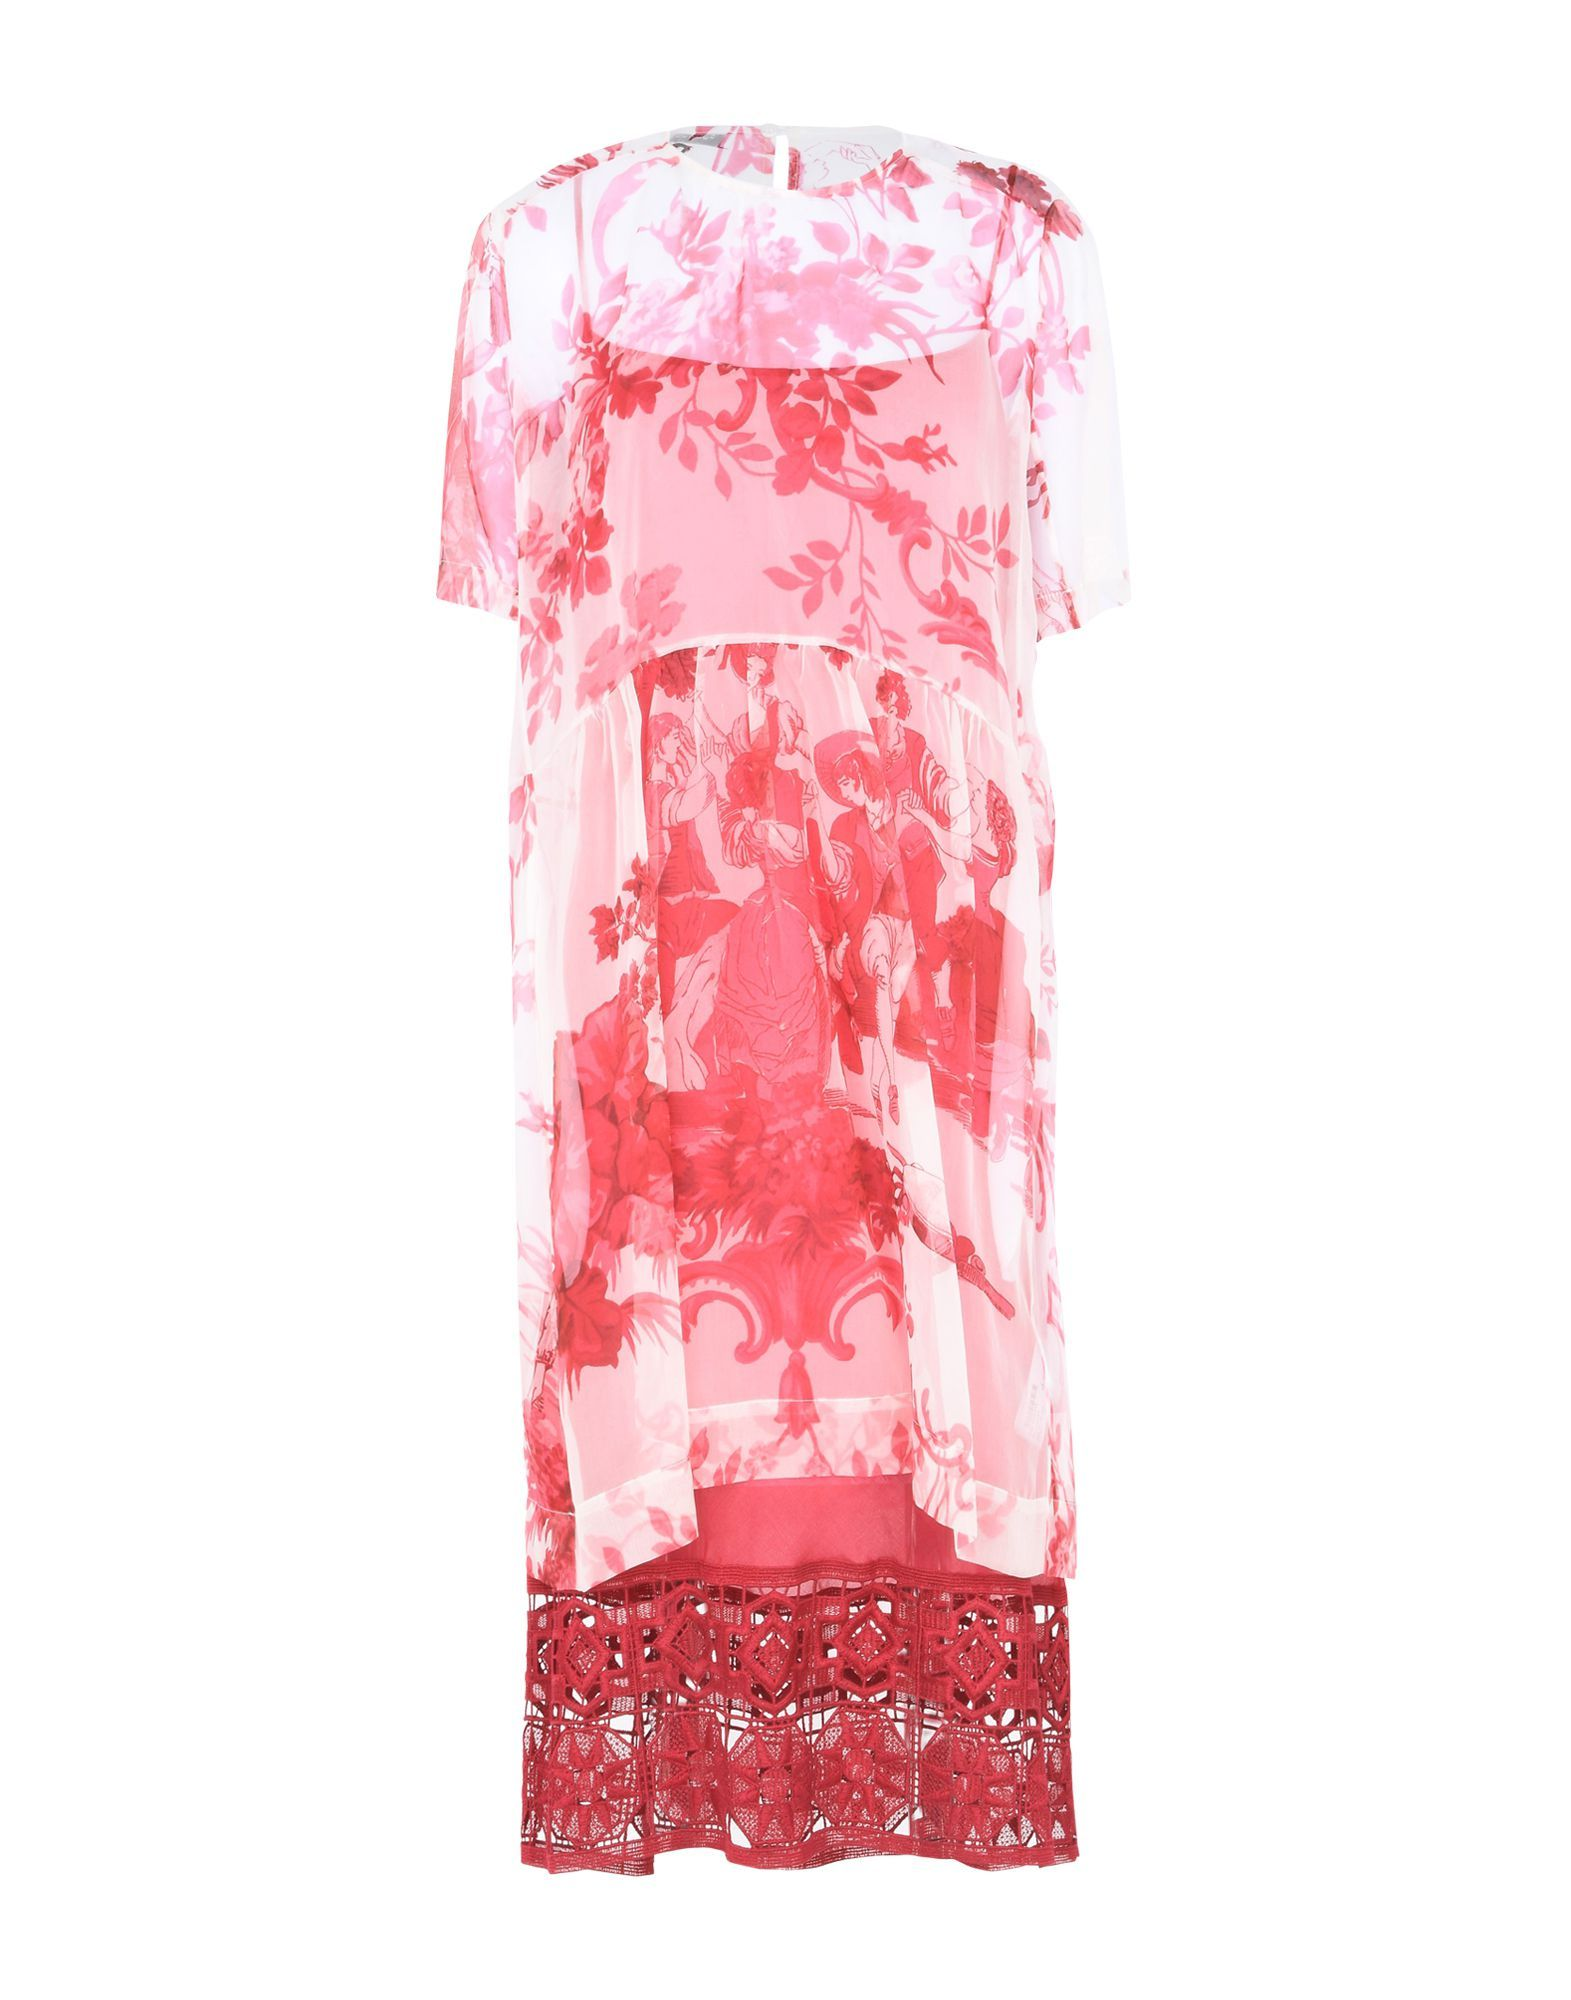 Dondup Fuchsia Floral Design Cotton Dress